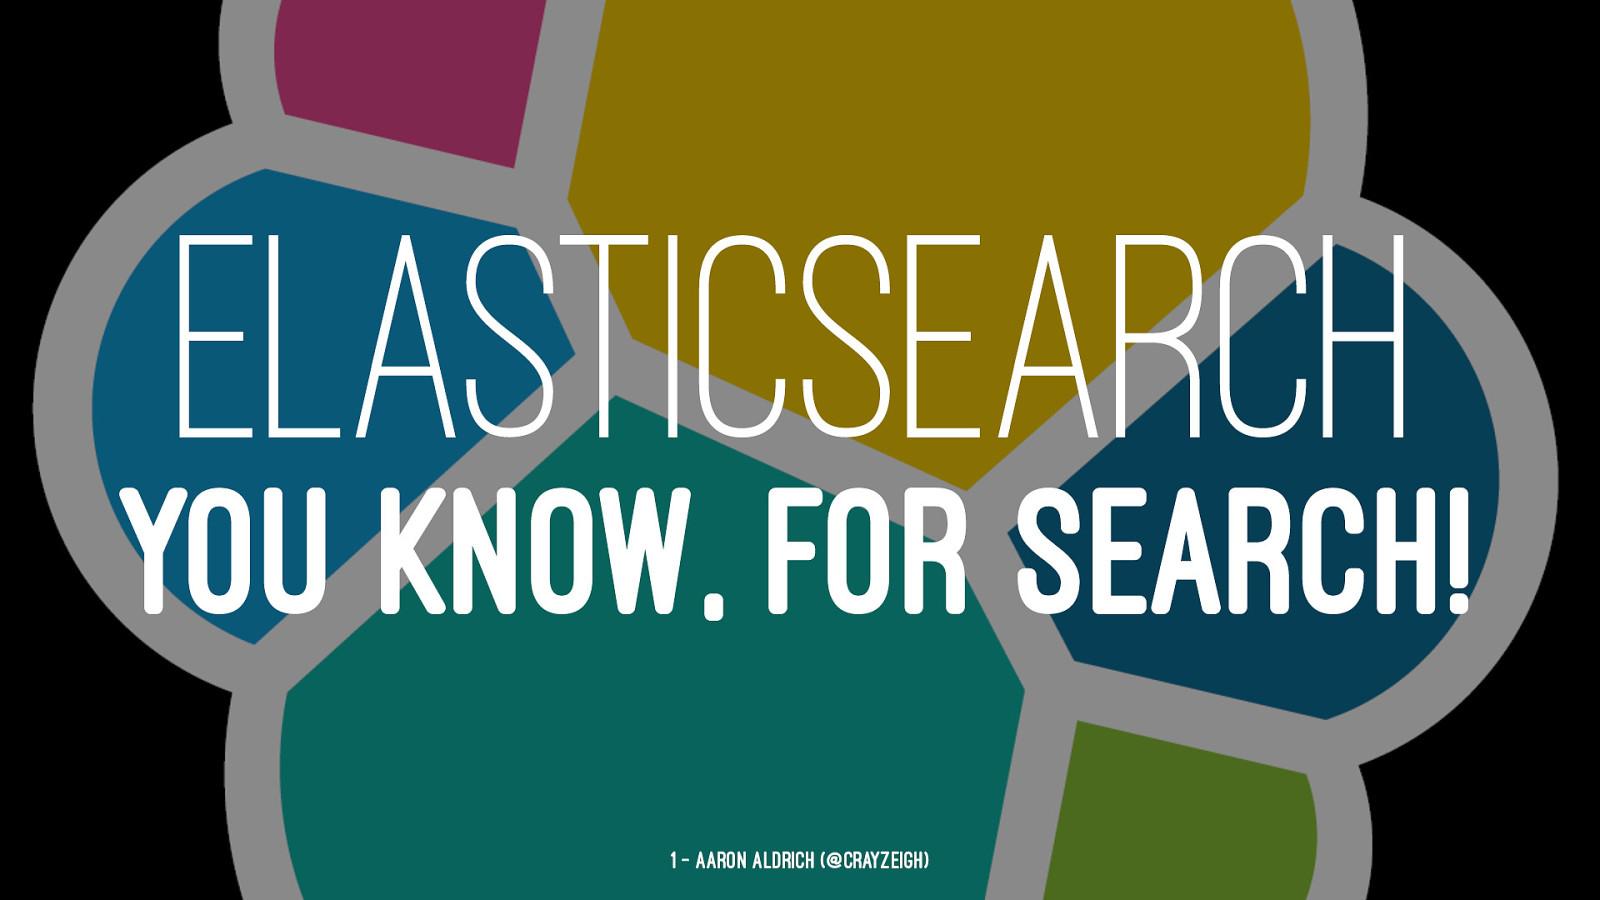 Inspirational Elasticserach